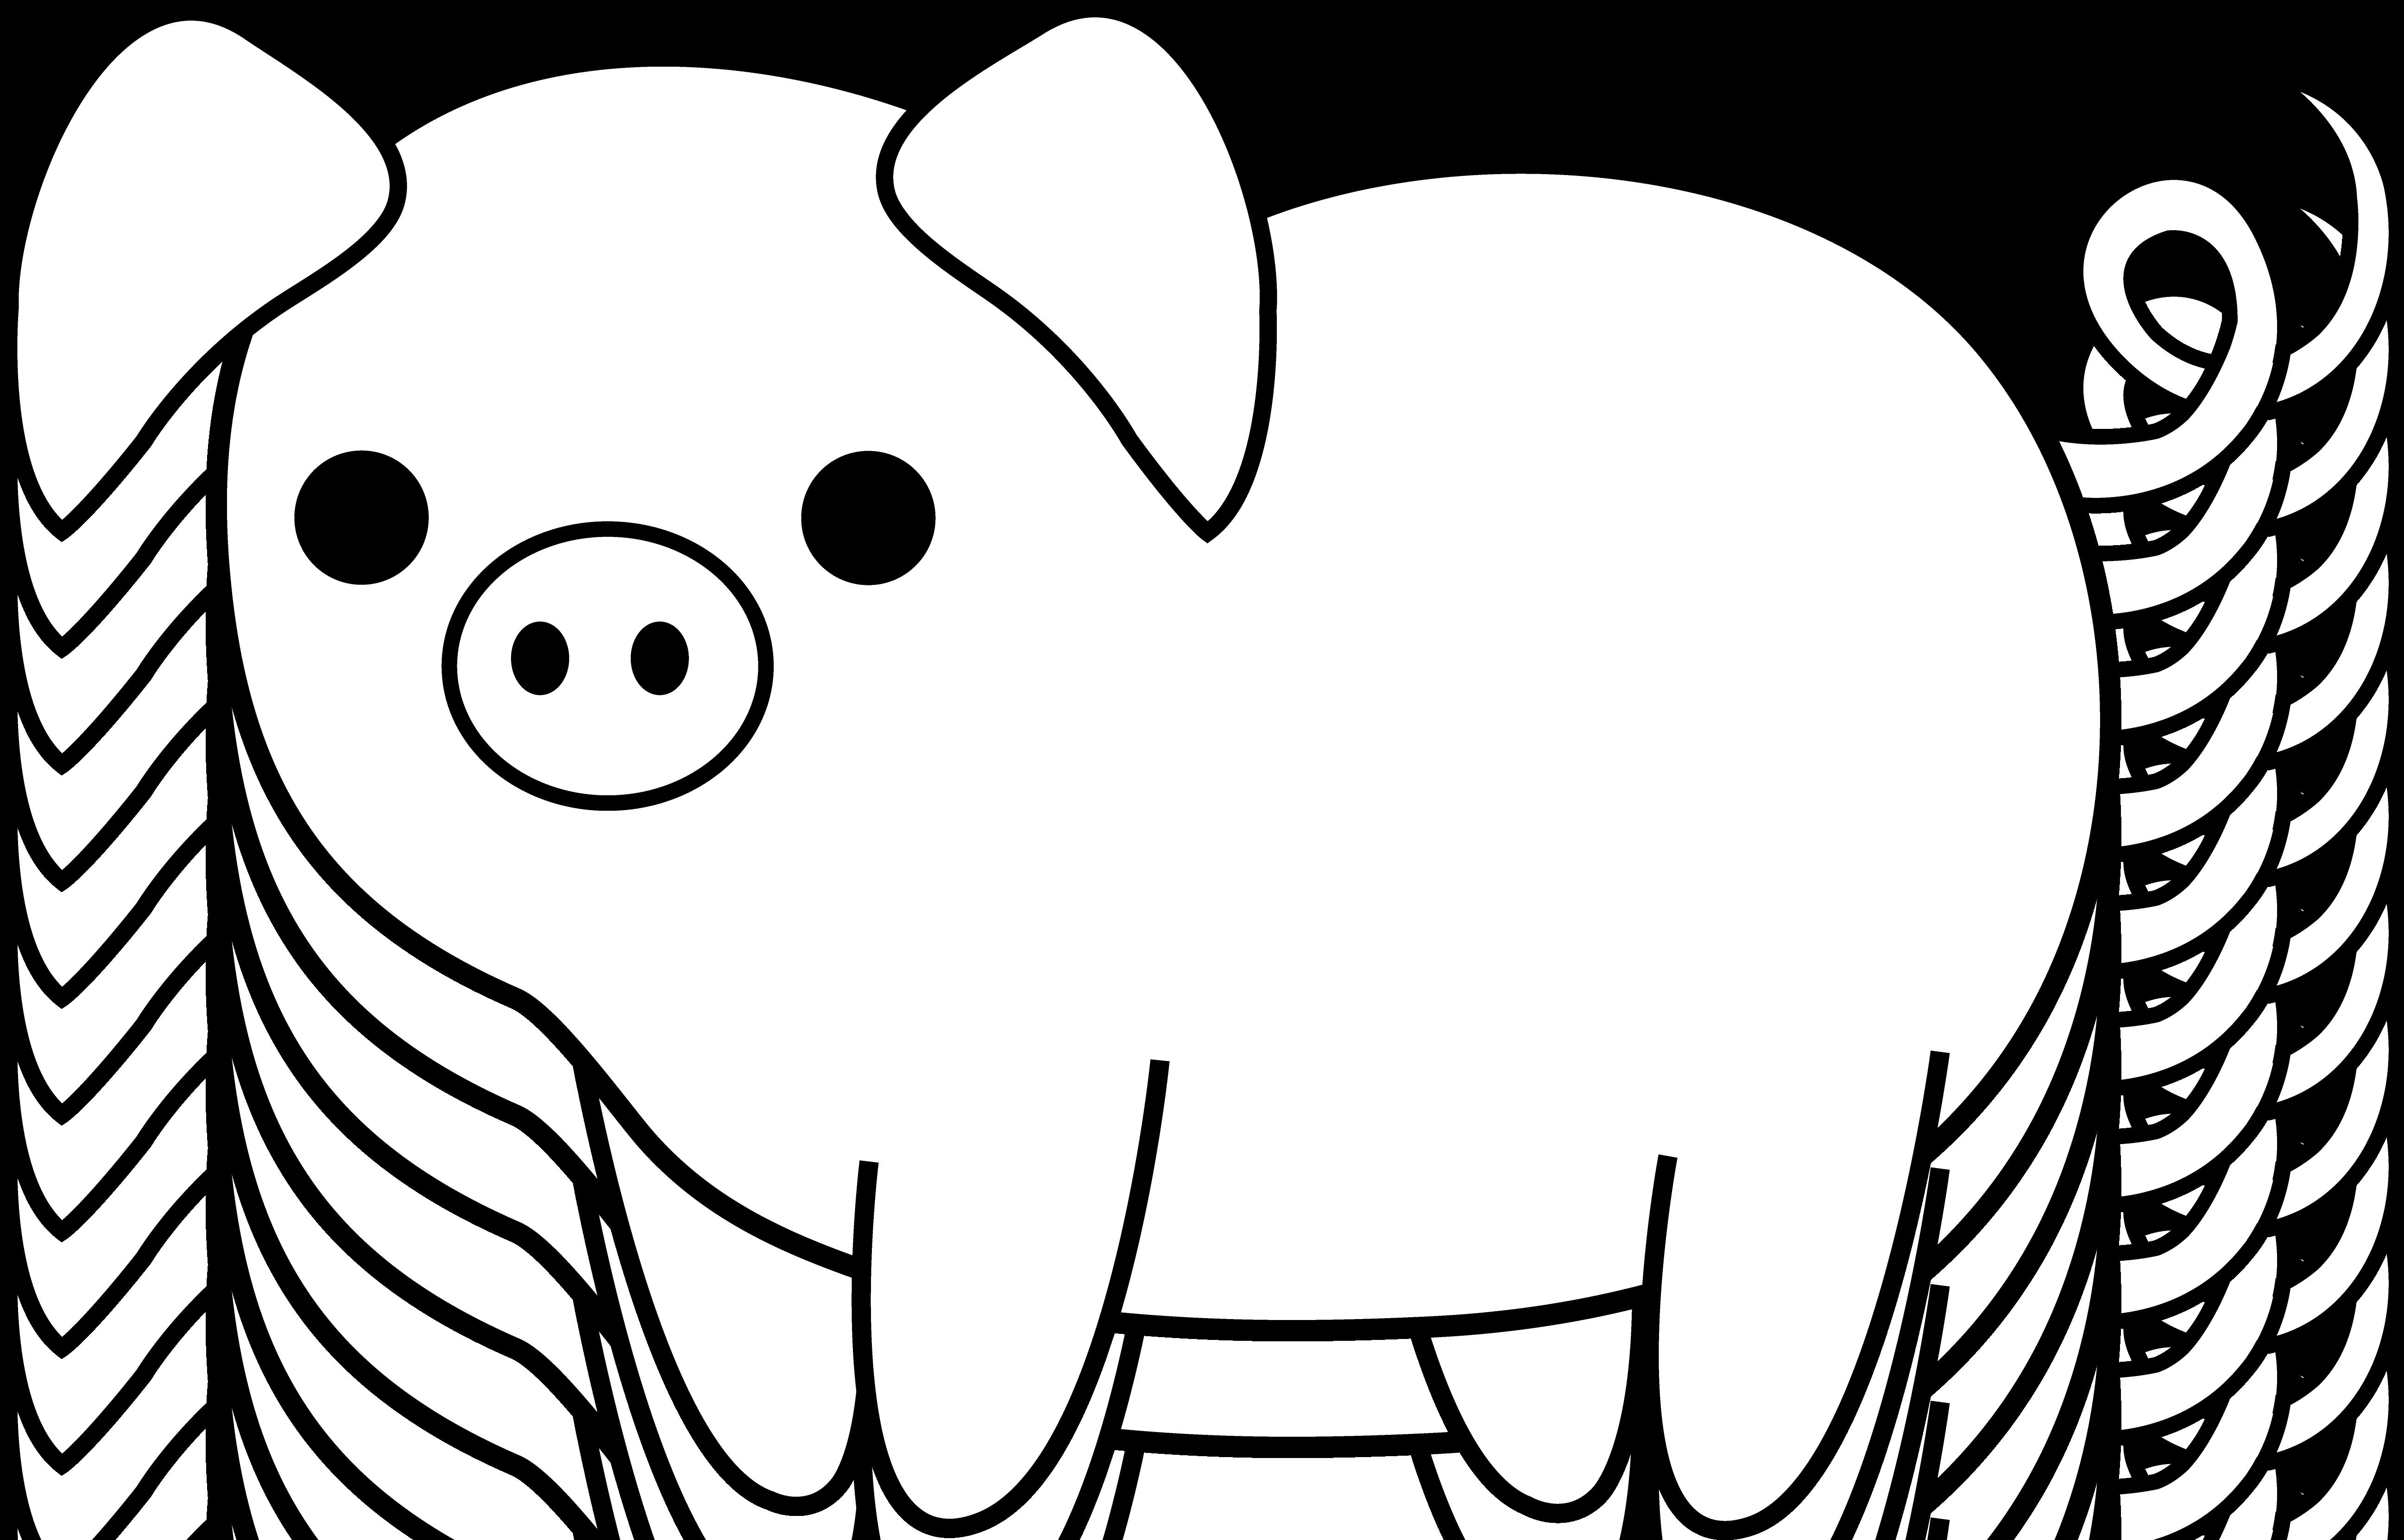 Free Pig Line Art, Download Free Clip Art, Free Clip Art on.